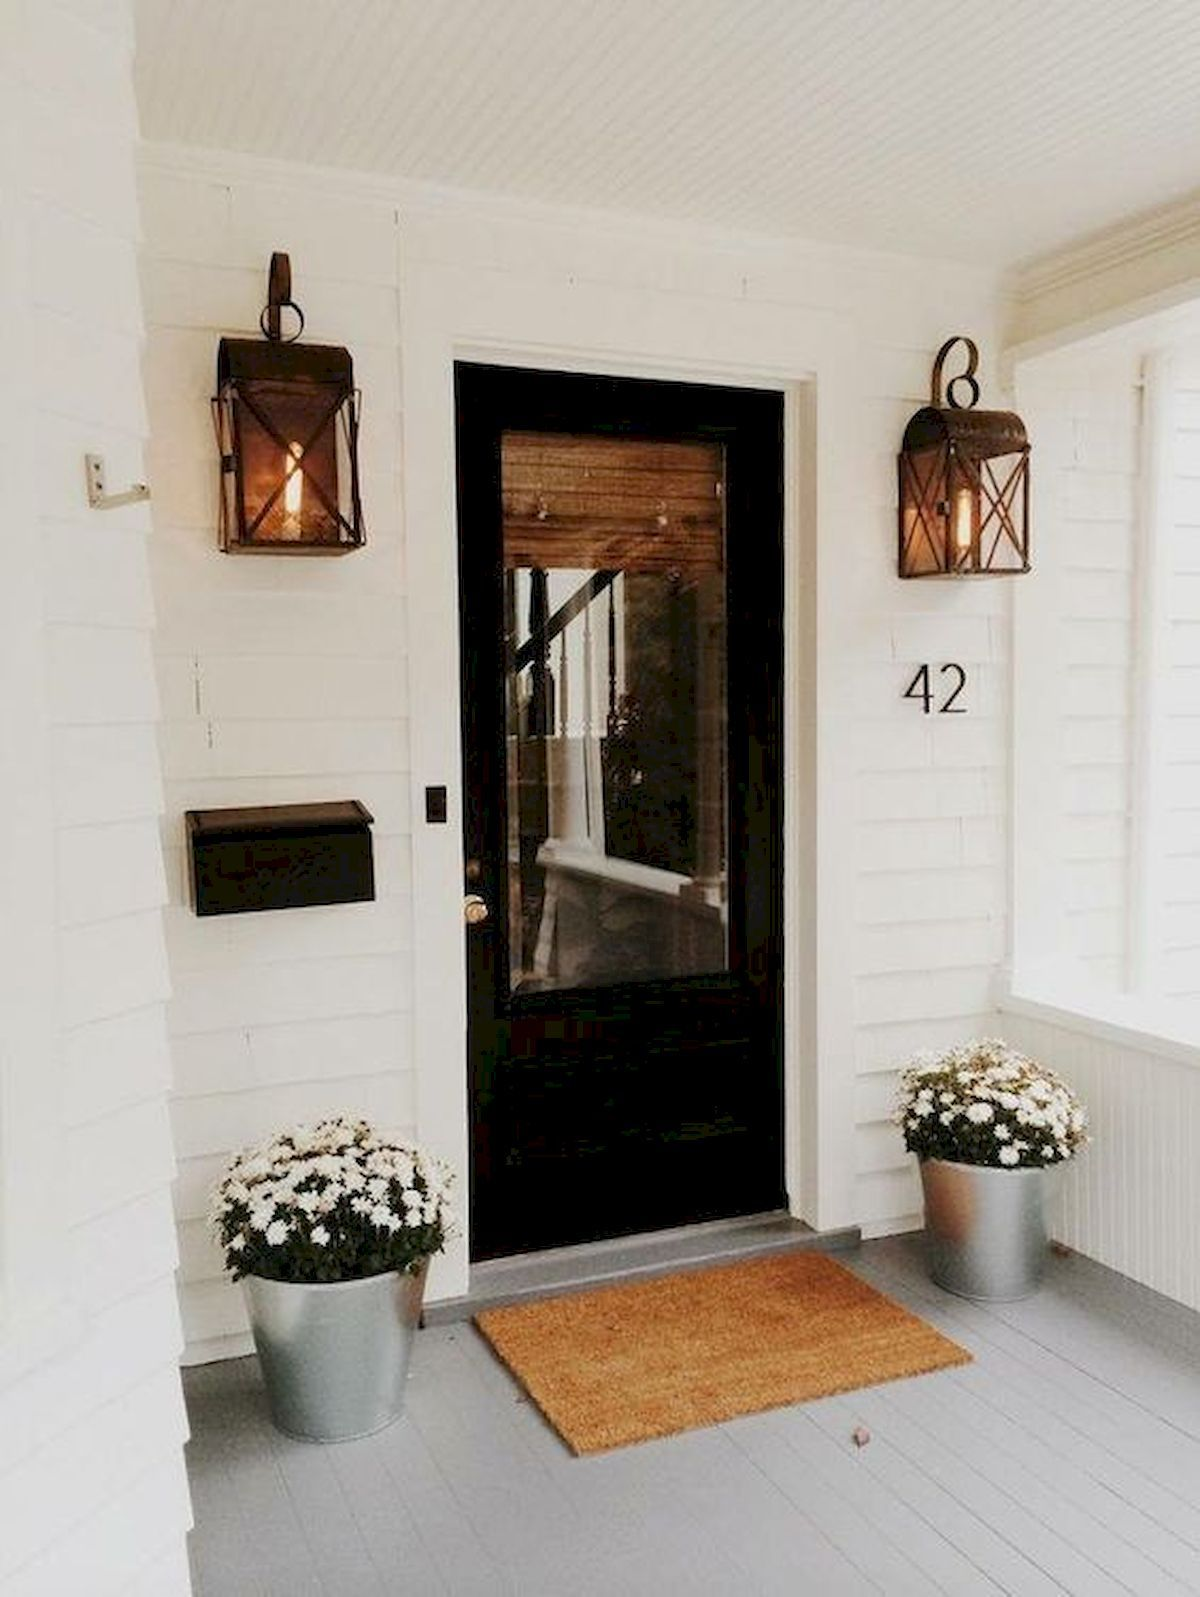 Bestes hausfrontdesign  best modern farmhouse front door entrance design ideas  front